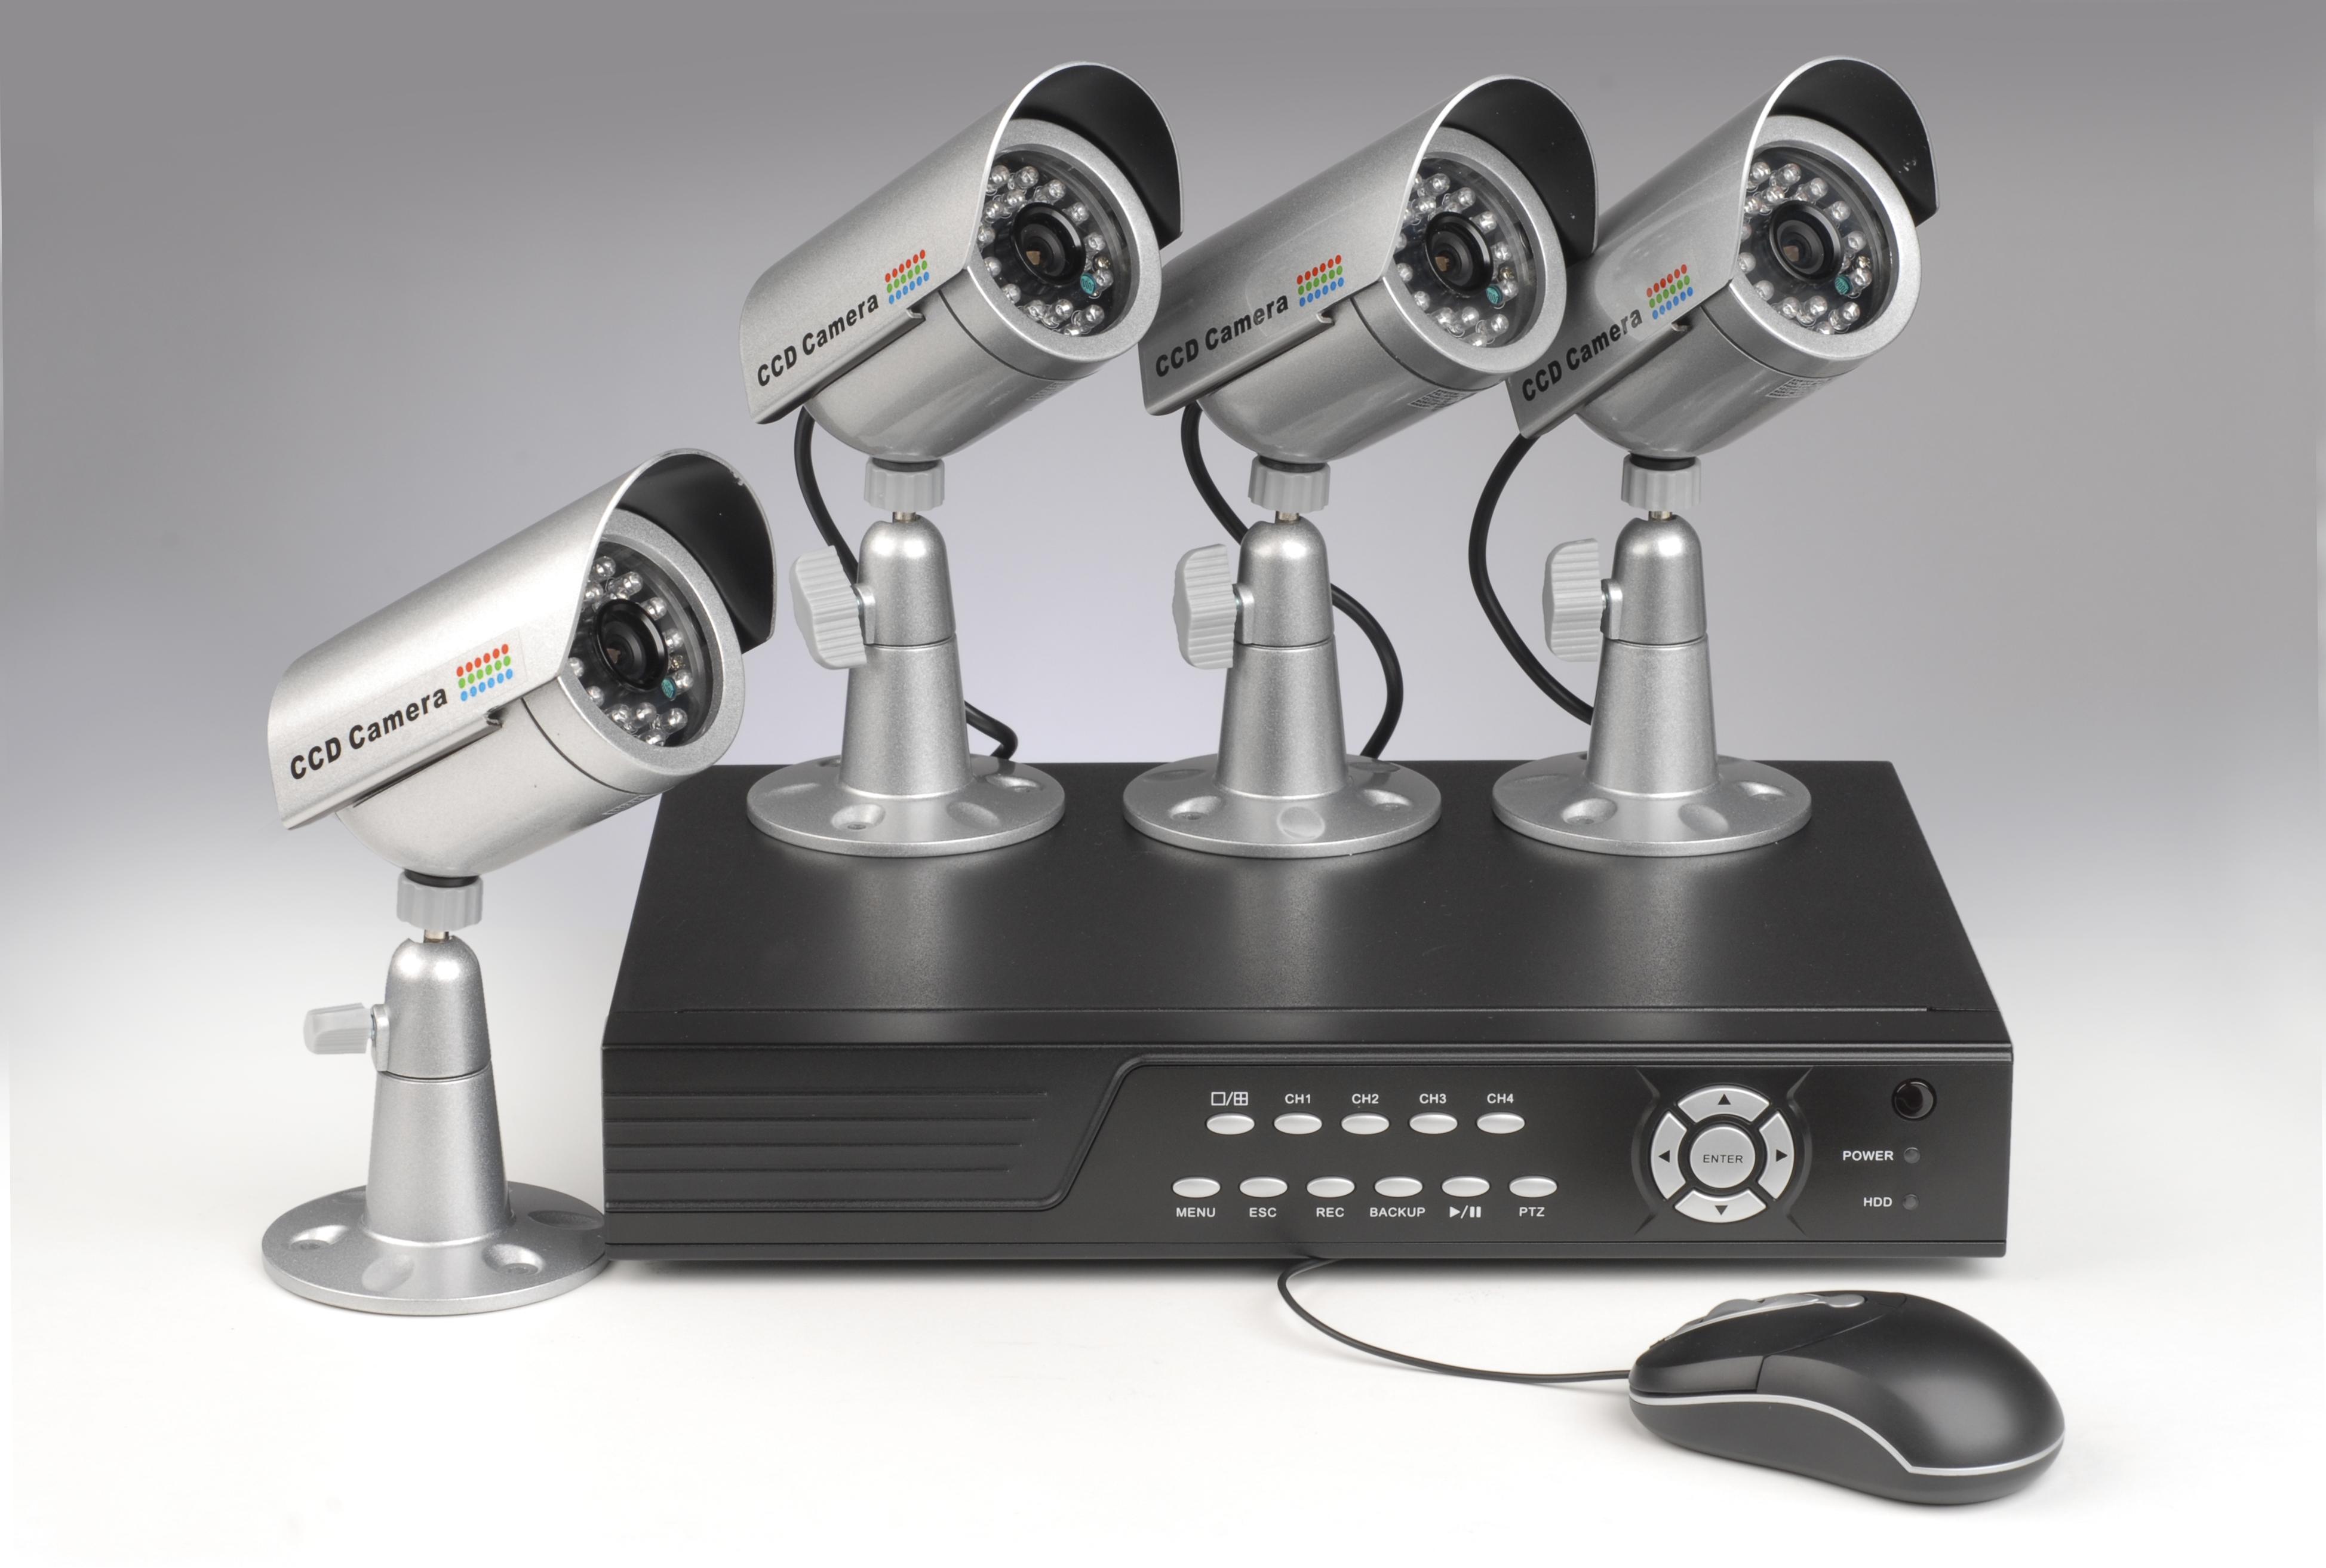 CCTV Pricing